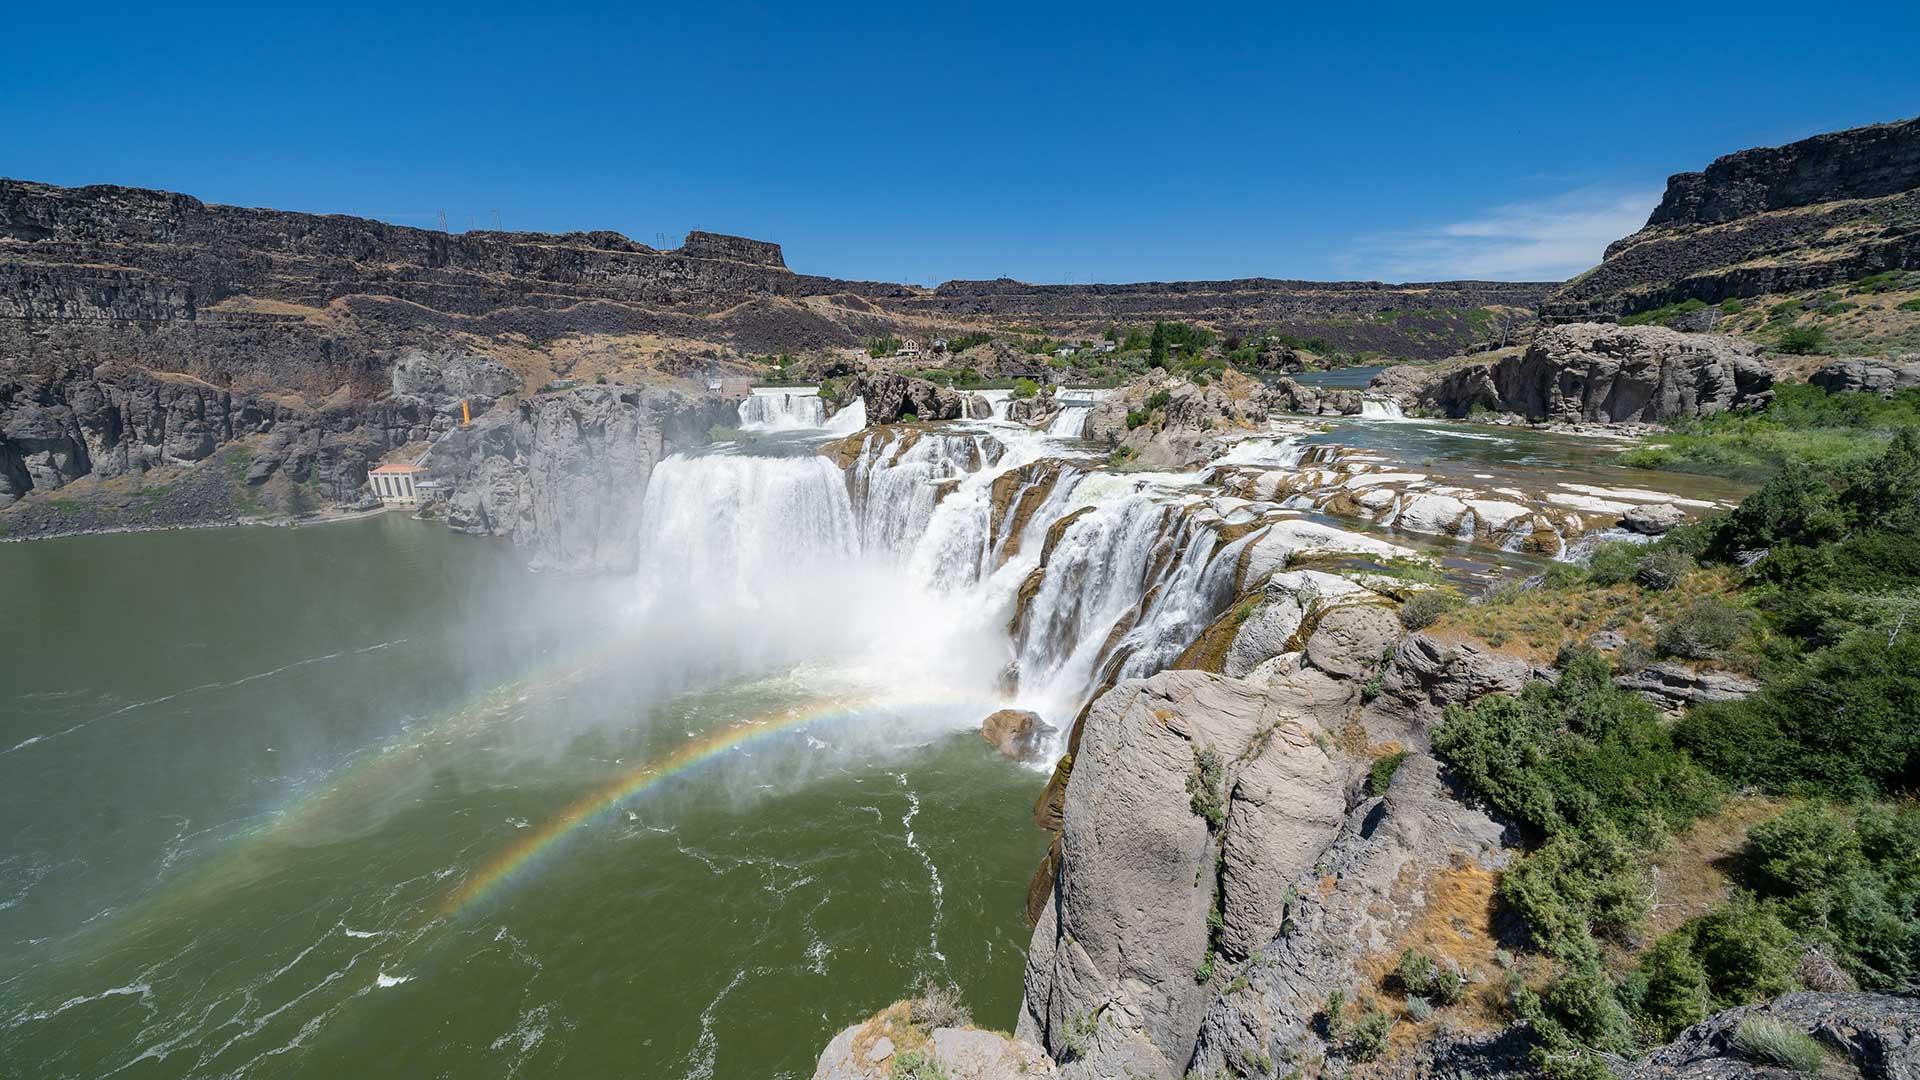 Panorama to illustrate dating in idaho falls